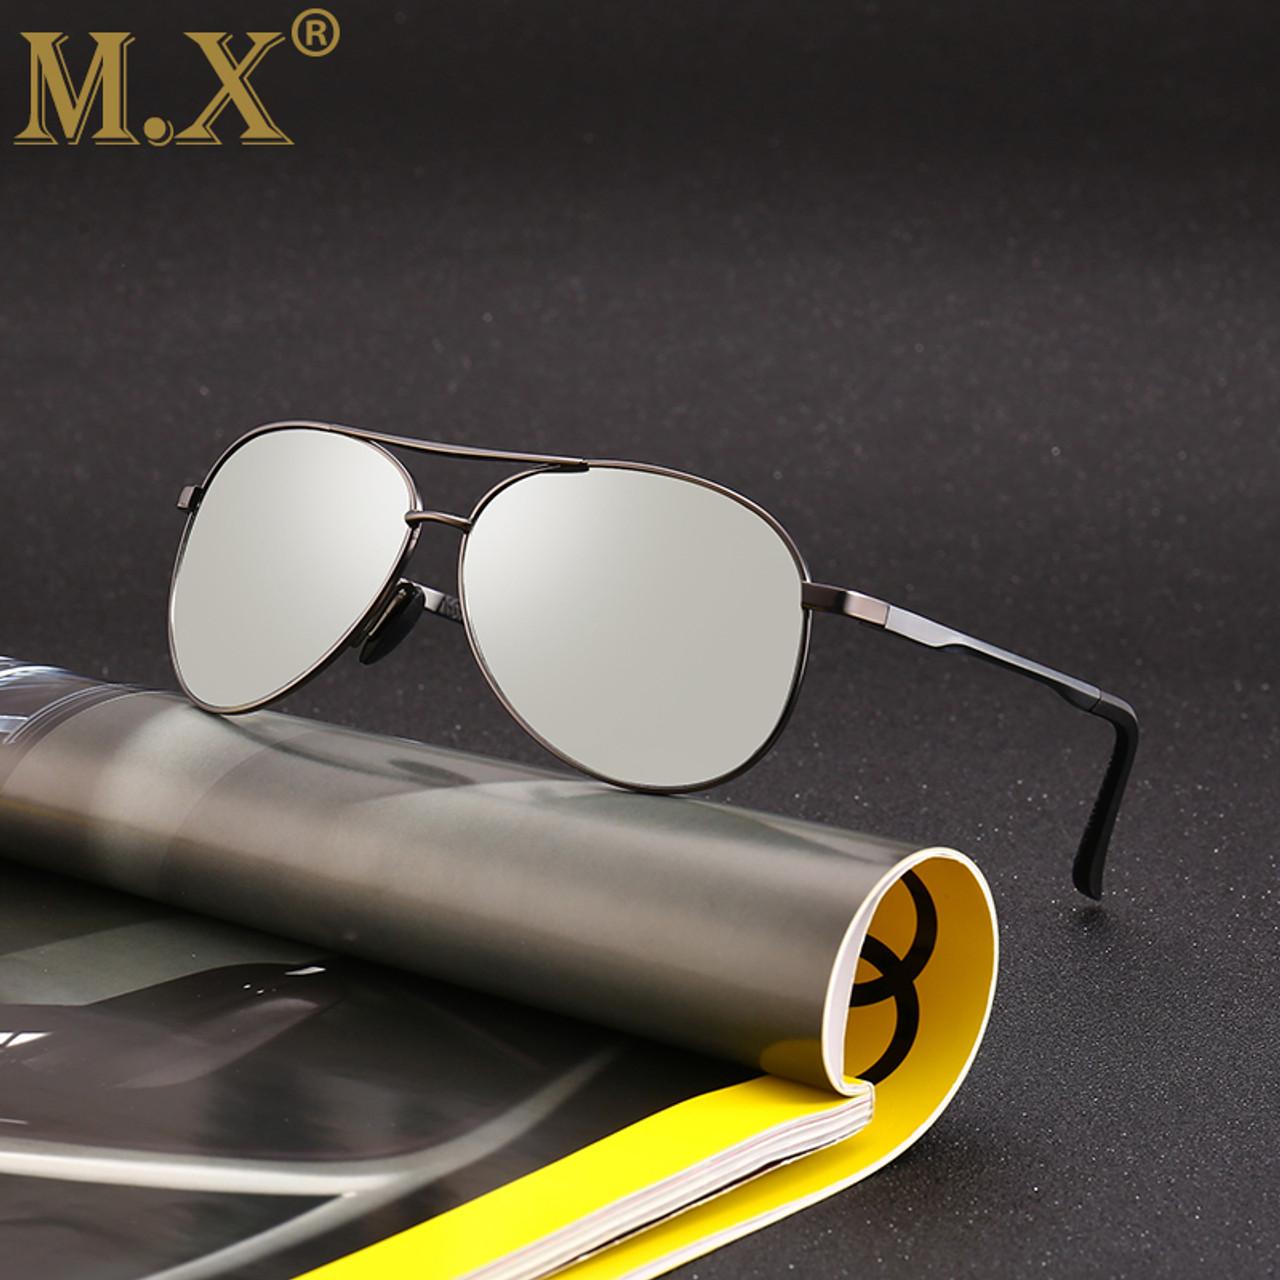 baa36ecd3062b ... 2018 Pilot Photochromic Sunglasses Men Driving Polarized Sun Glasses  Chameleon Driver Safety Night Vision Goggles Glasses ...